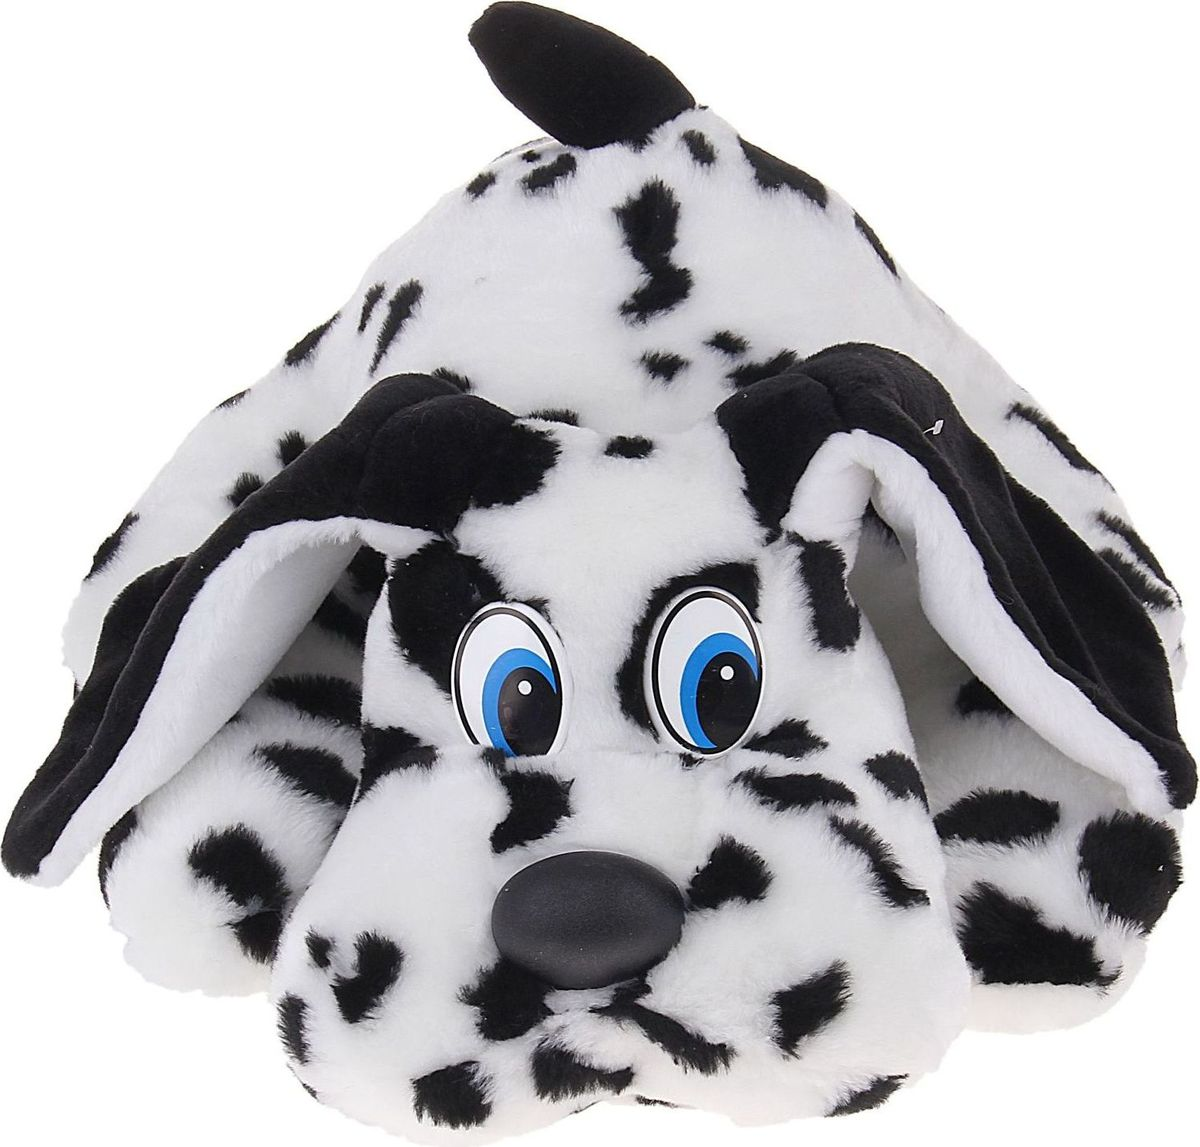 Sima-land Мягкая игрушка Собака Тошка средняя 49 см фонтант sima land летняя прохлада колодец